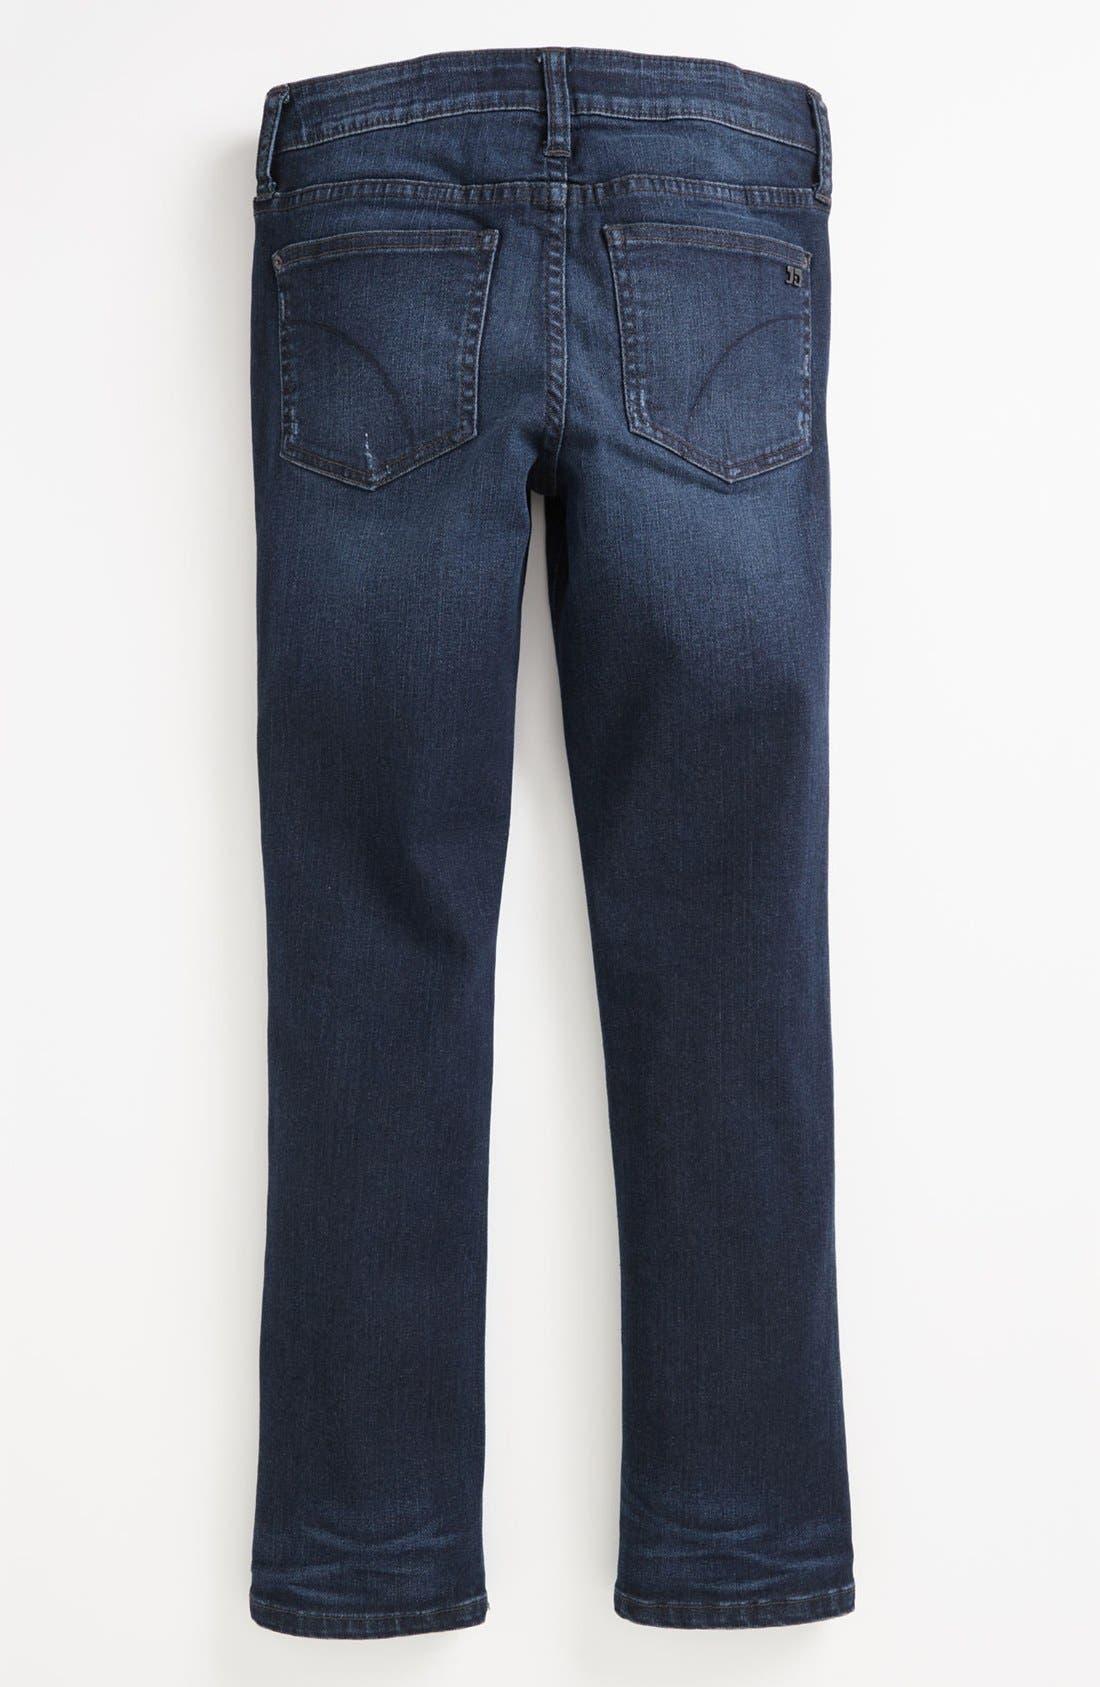 Alternate Image 1 Selected - Joe's 'Brixton' Straight Leg Jeans (Little Boys)